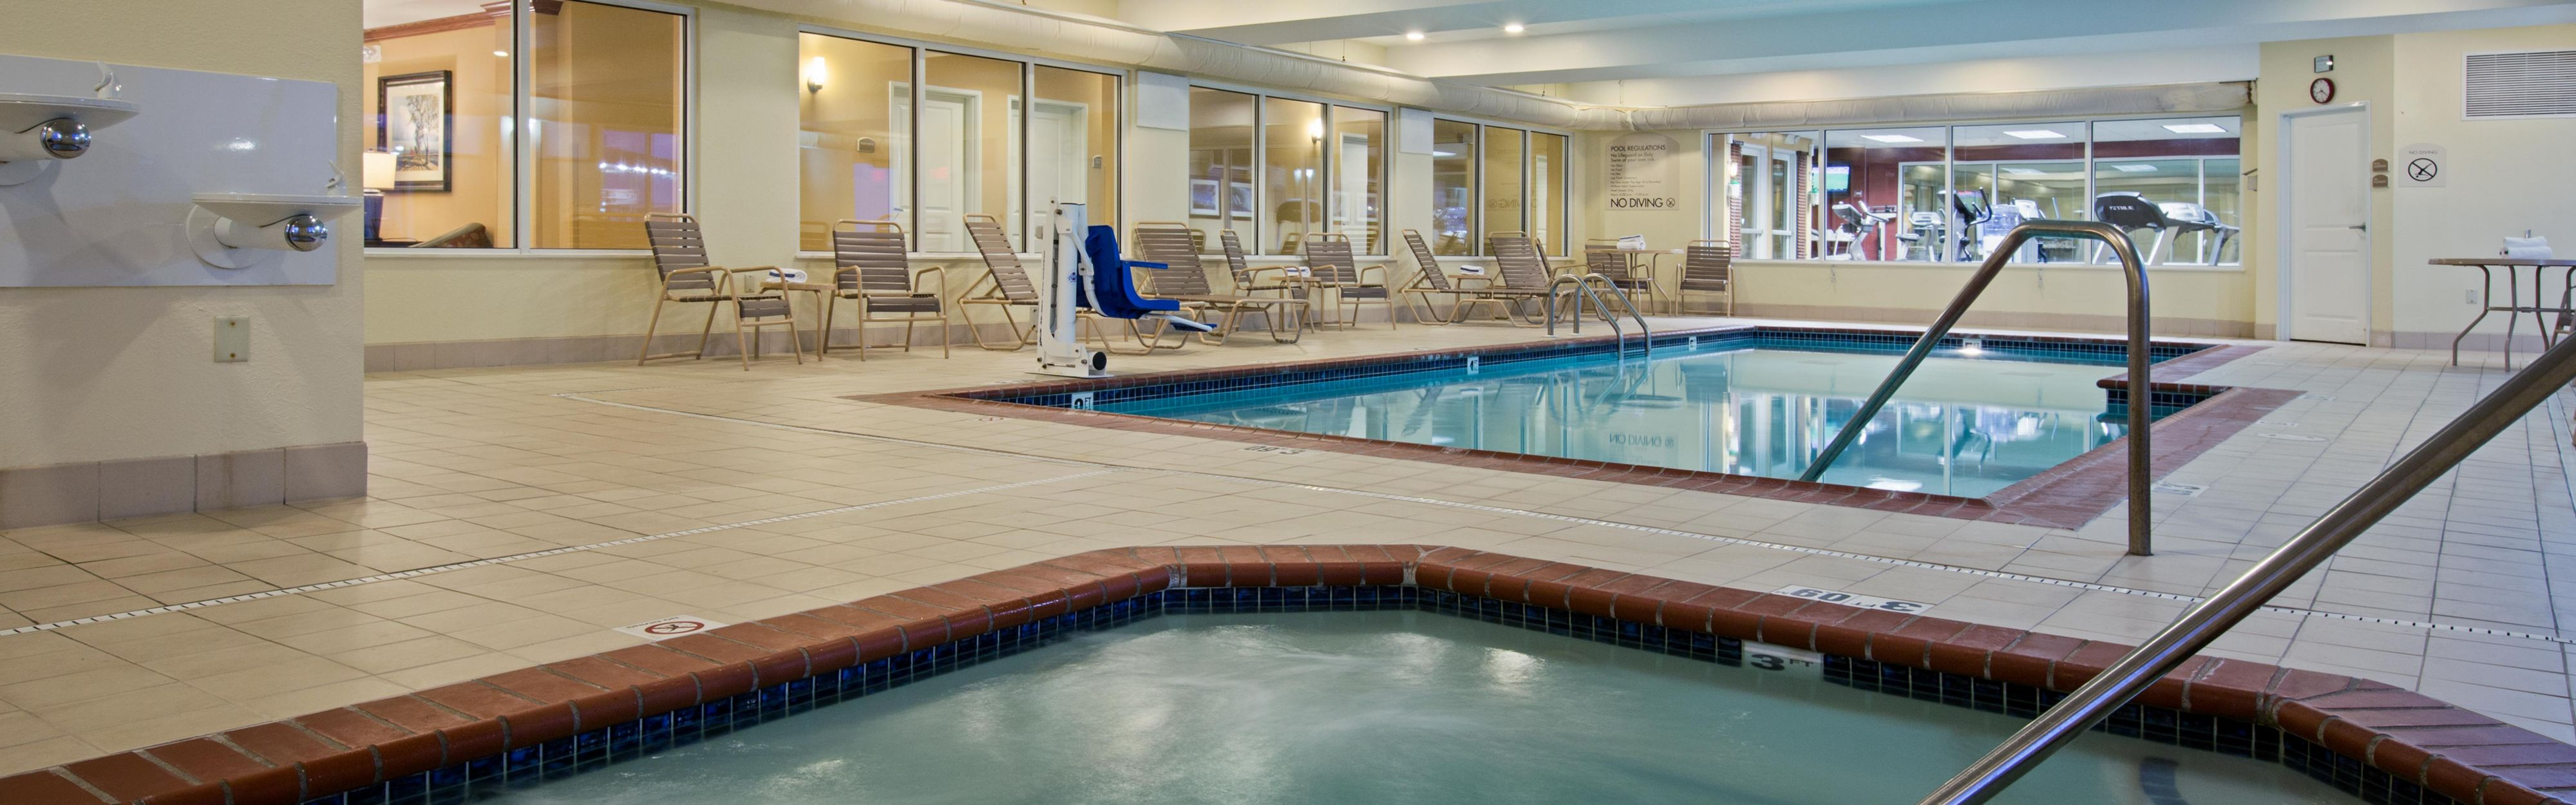 Holiday Inn Express & Suites Vandalia image 2